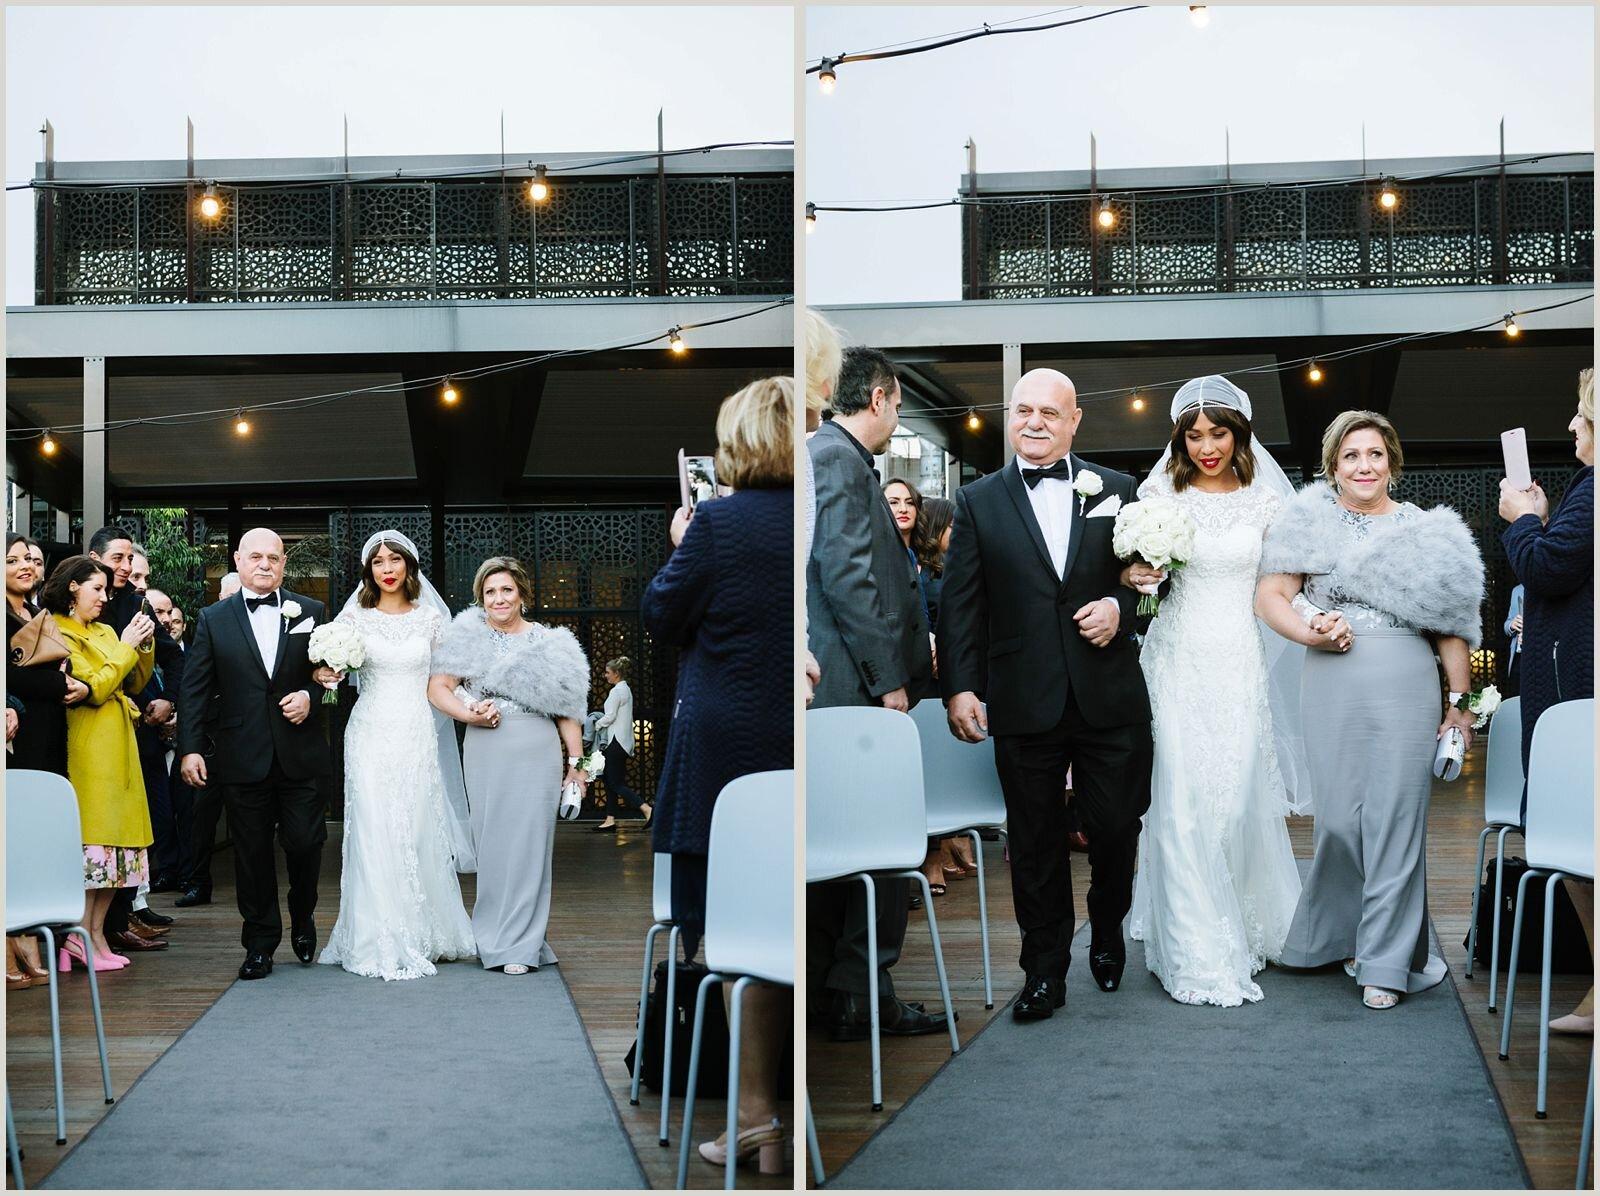 joseph_koprek_wedding_melbourne_the_prince_deck_0050.jpg